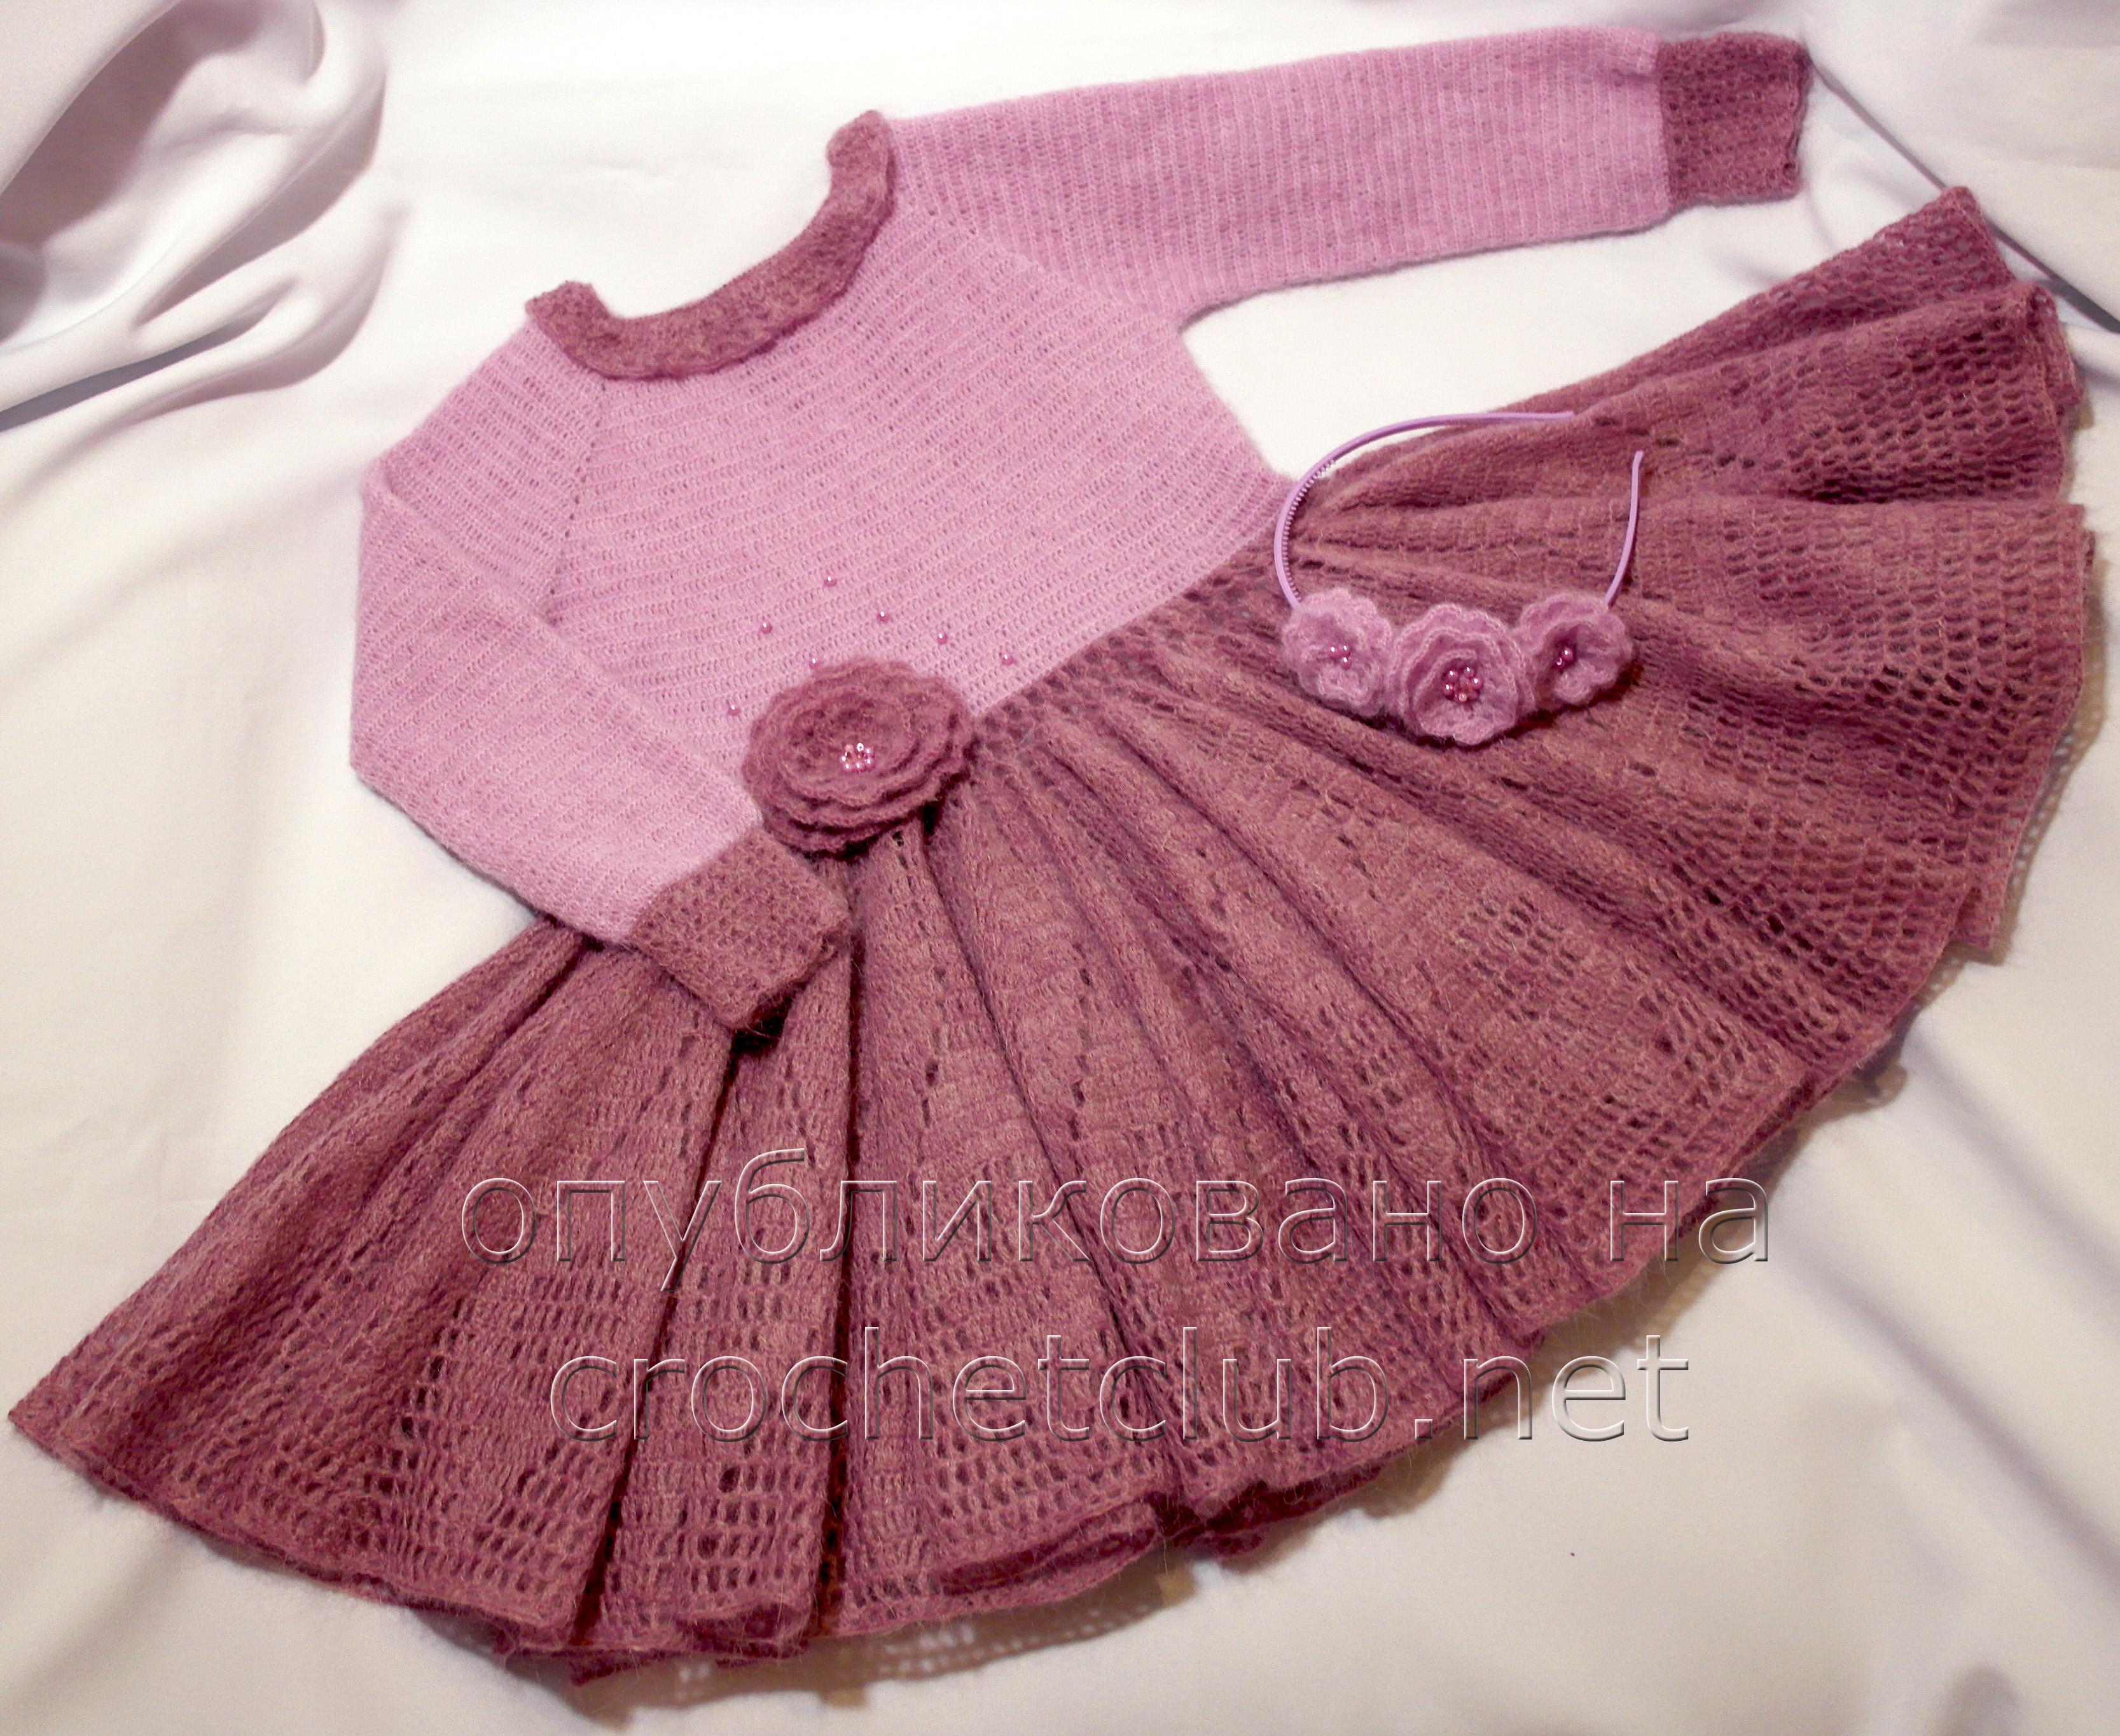 юбка розовая крючком схема